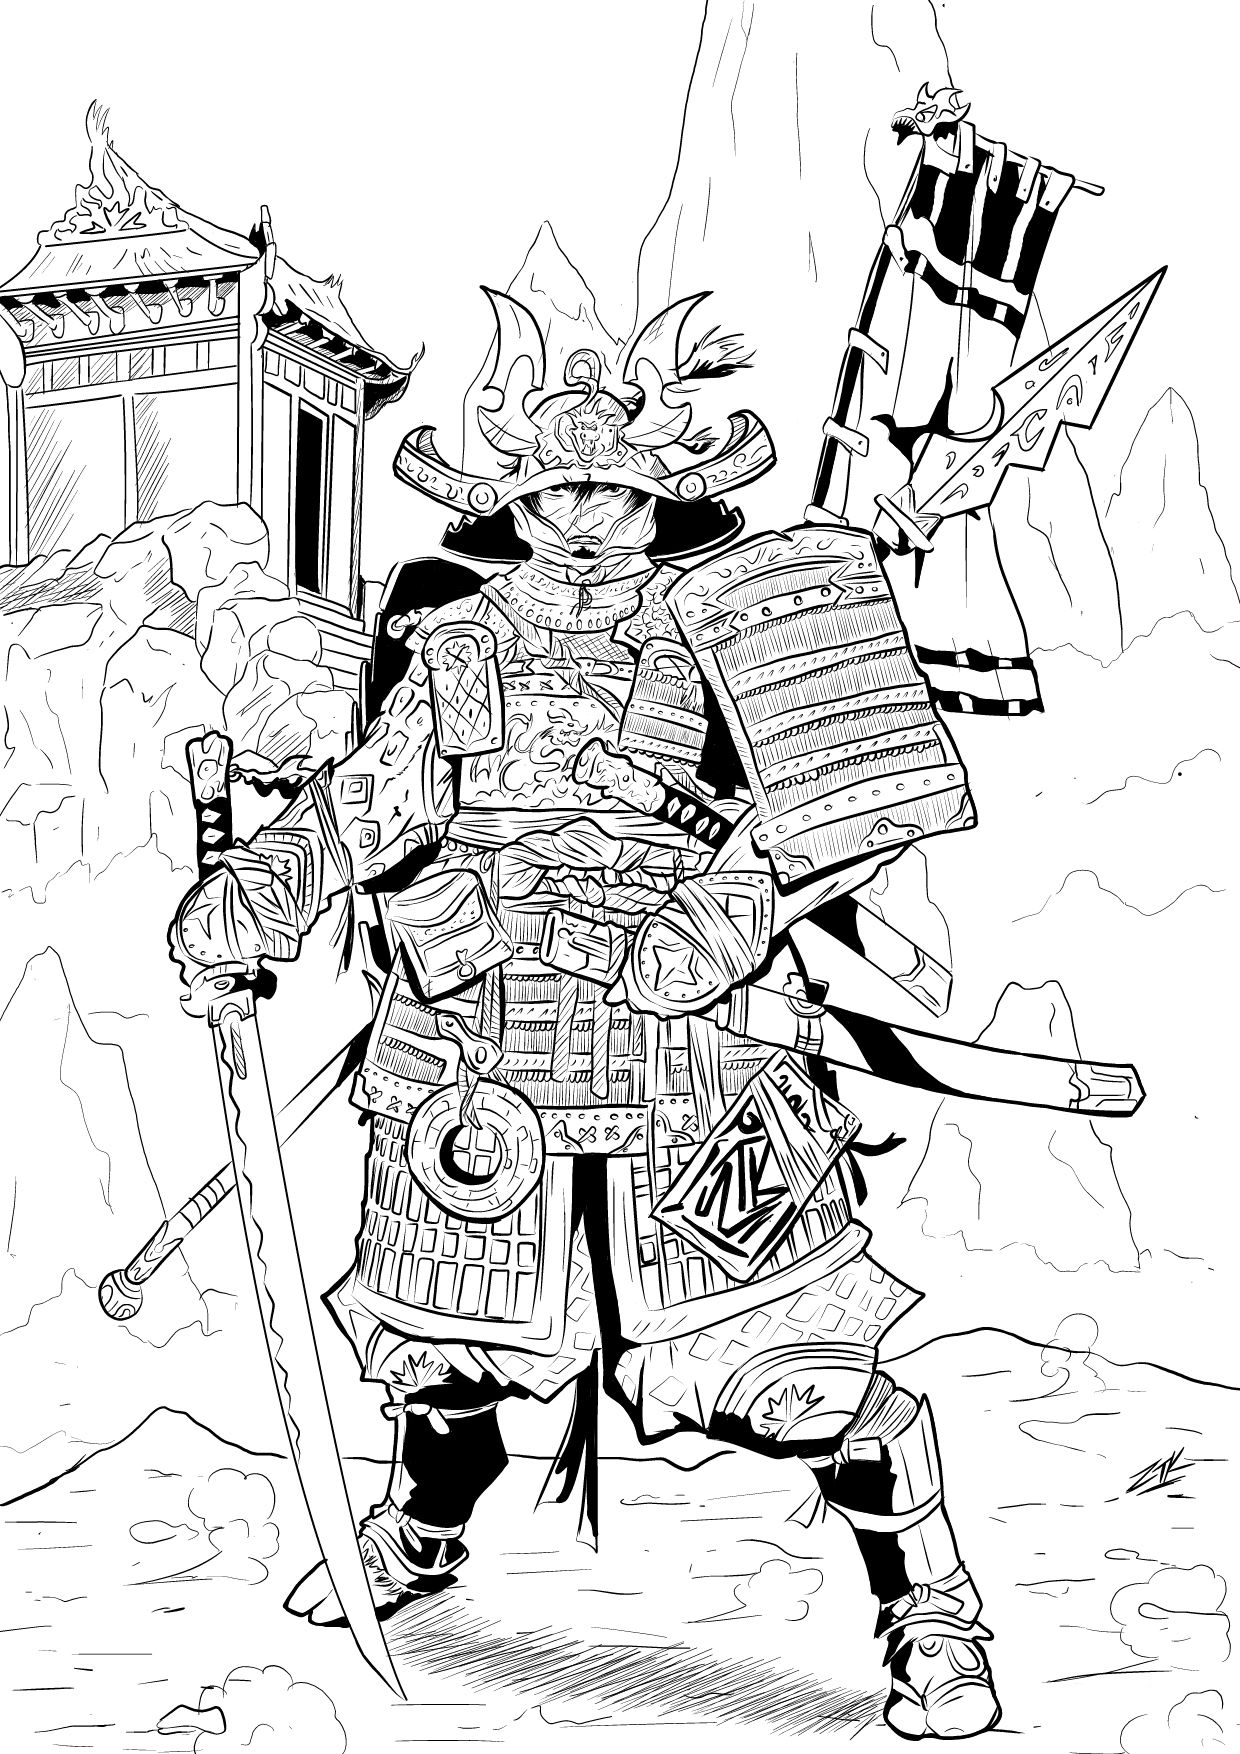 comment dessiner un samourai | Tattoos | Pinterest | Arte manga ...